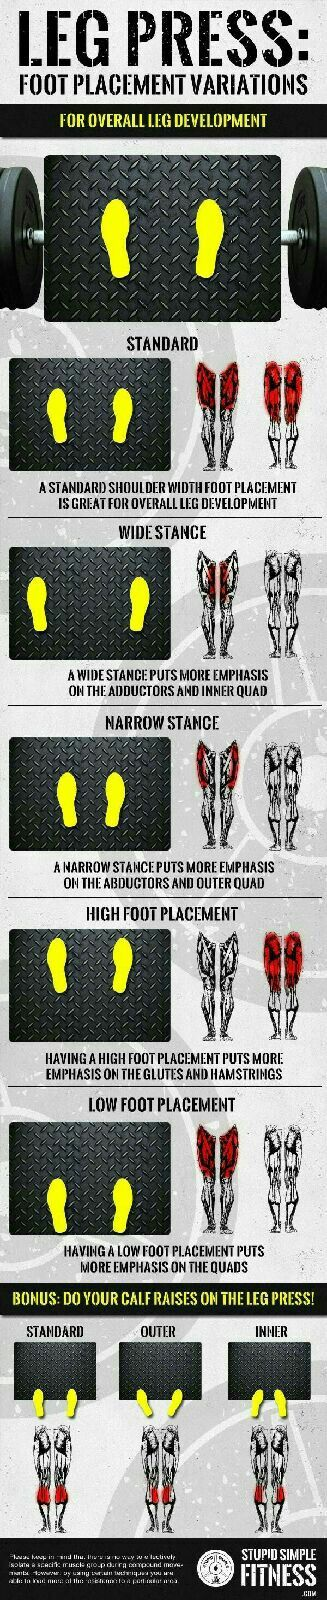 Leg Press Options